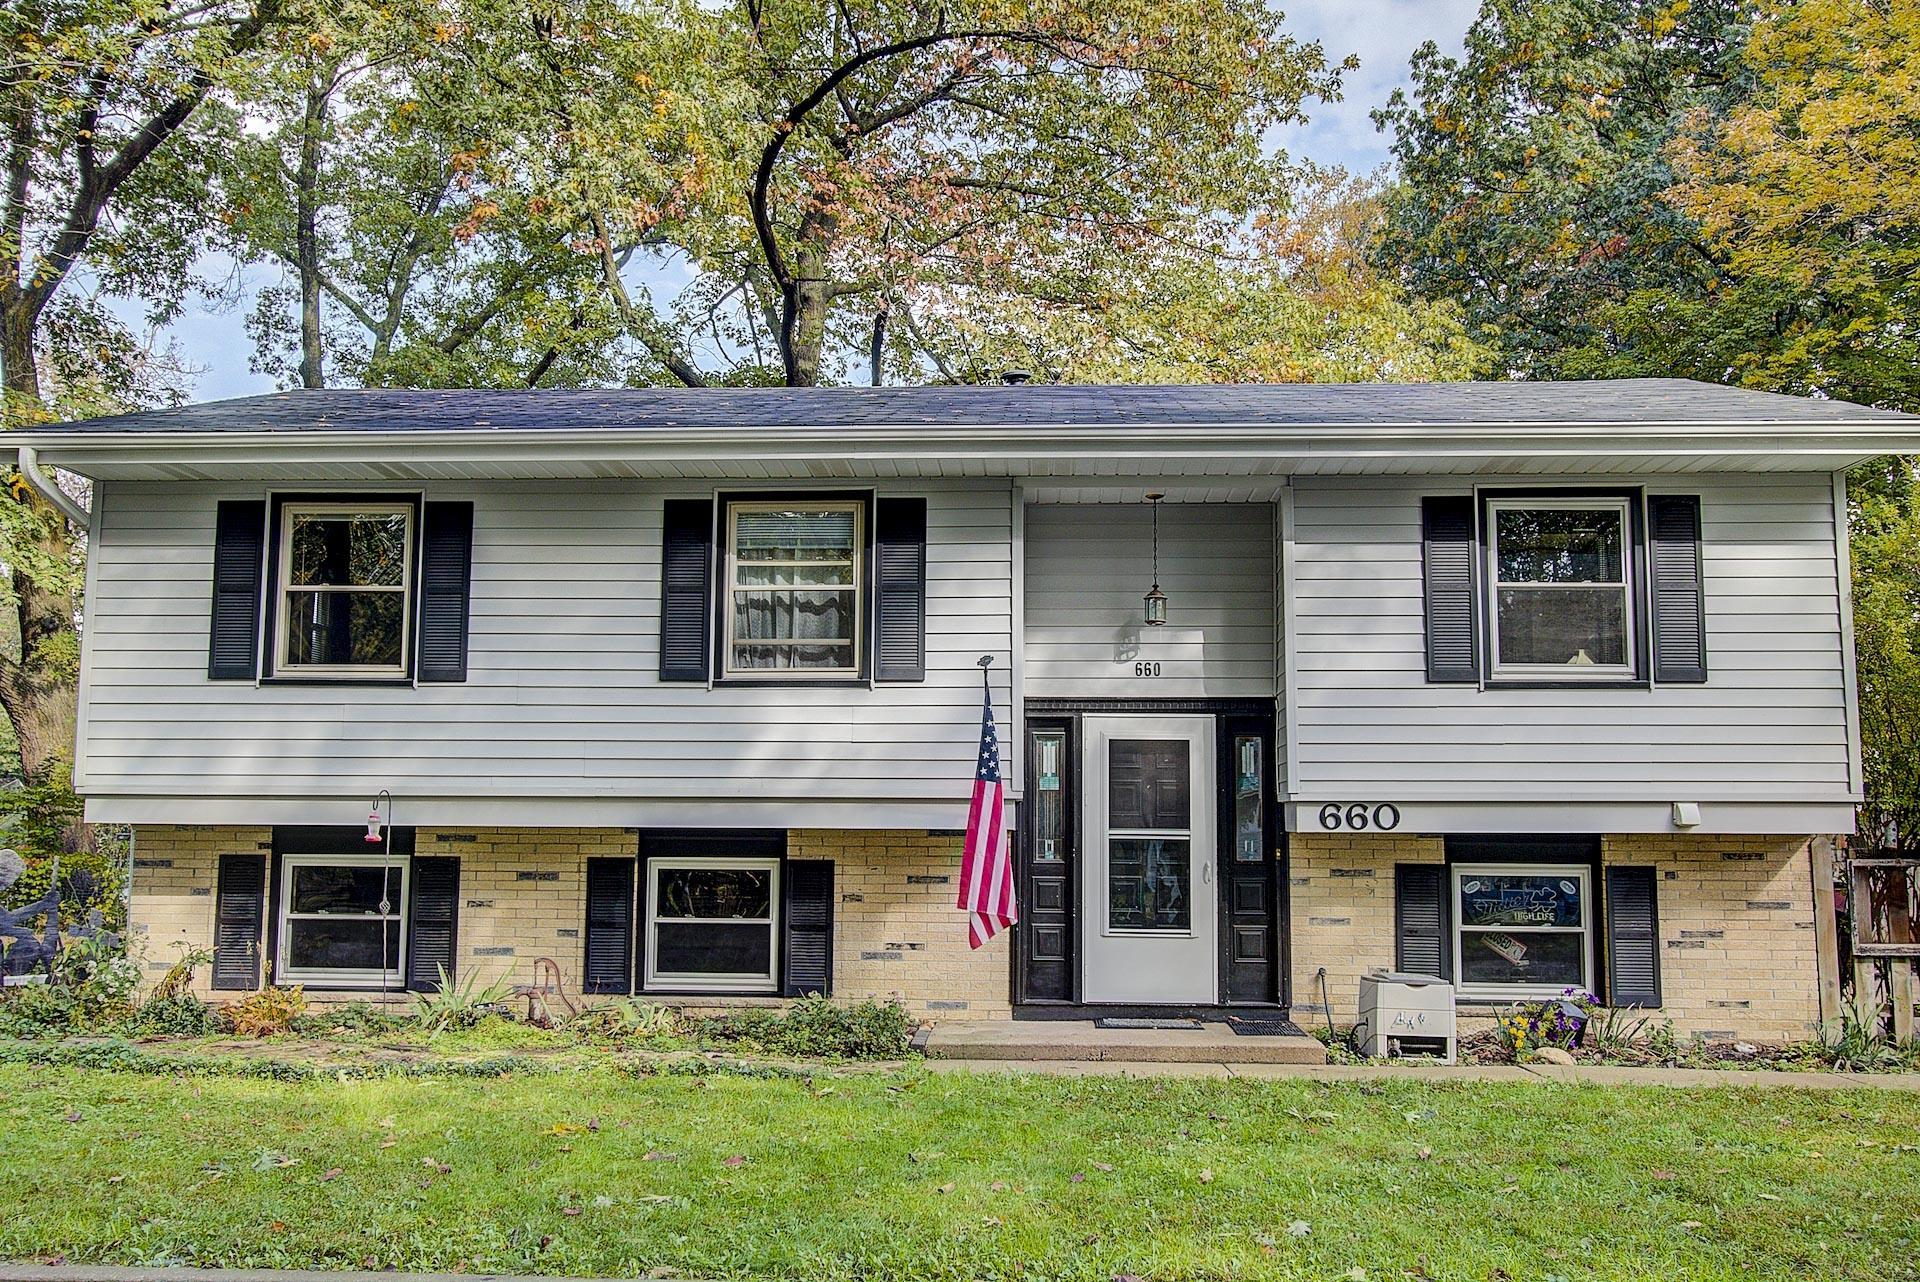 660 Madison St, Oconomowoc, Wisconsin 53066, 4 Bedrooms Bedrooms, 8 Rooms Rooms,1 BathroomBathrooms,Single-Family,For Sale,Madison St,1609733